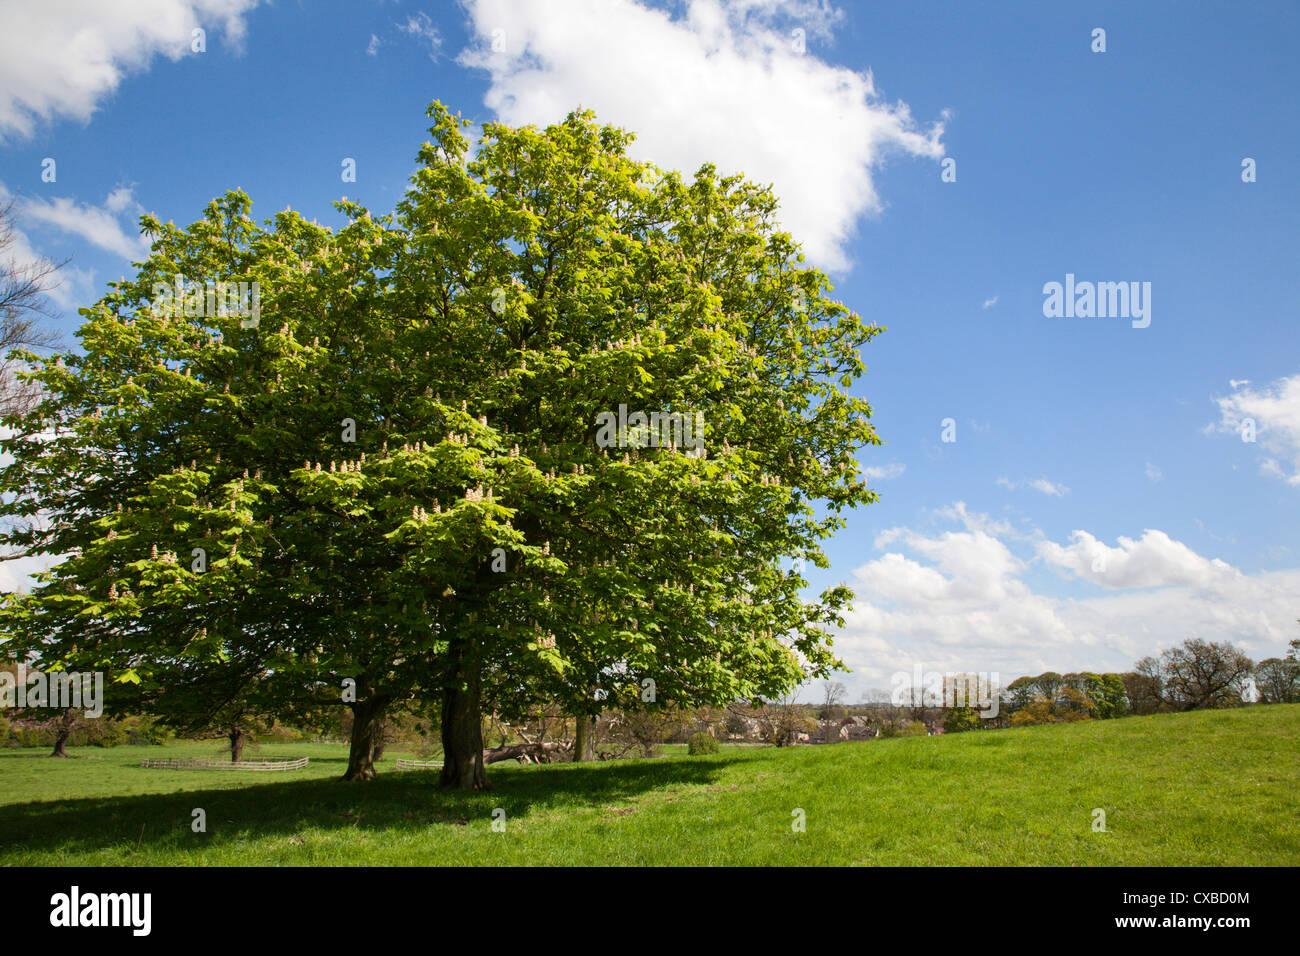 Spring trees in Jacob Smith Park, Knaresborough, North Yorkshire, England, United Kingdom, Europe - Stock Image